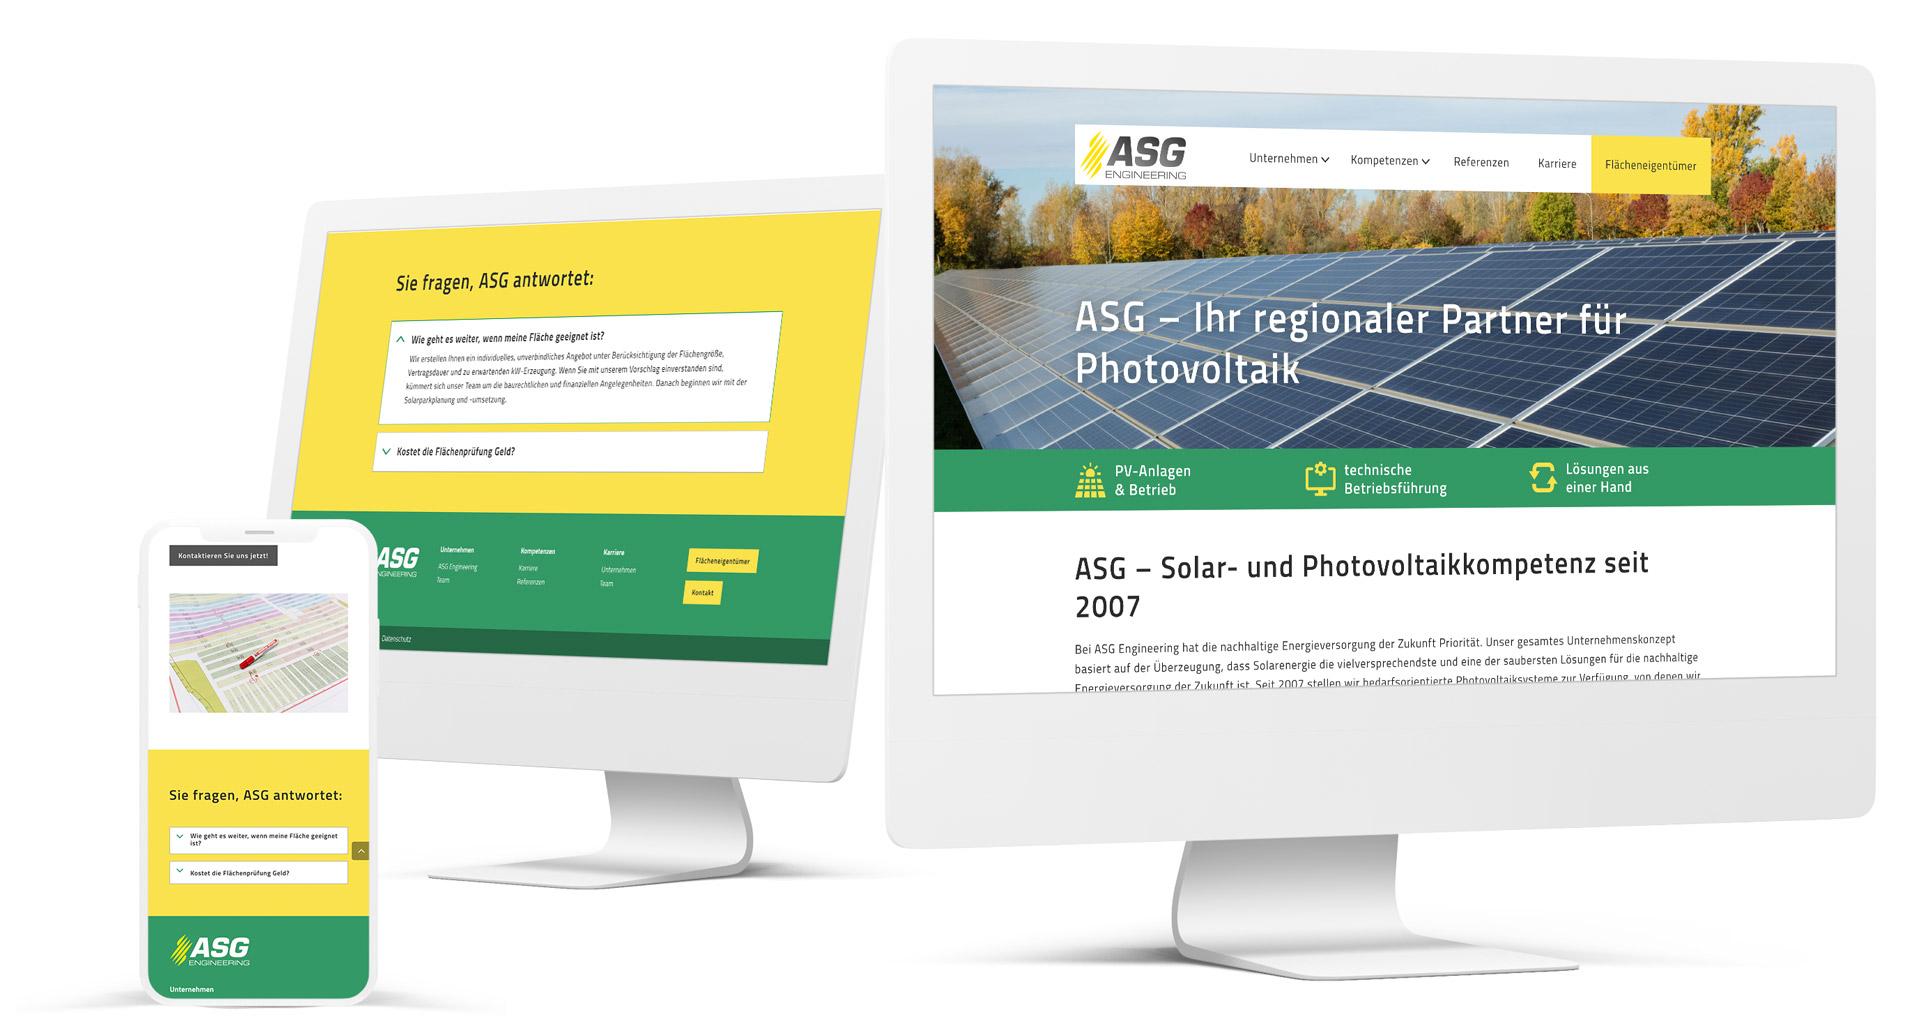 ASG Engineering: Solarenergie mit Photovoltaik-Systemen